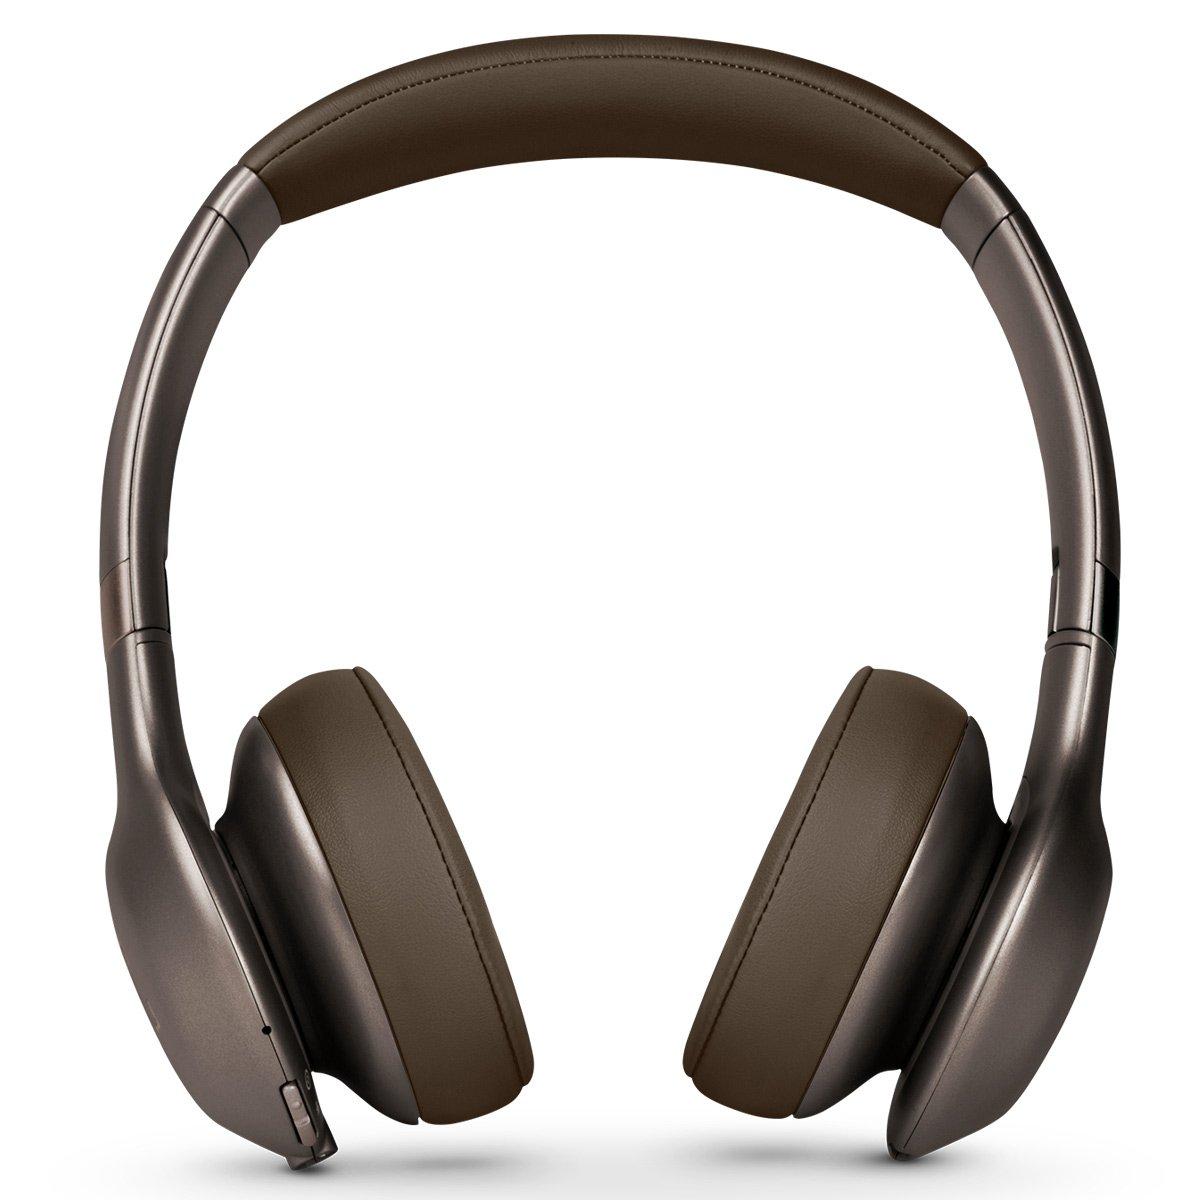 JBL V310BTBRN Everest 310 Wireless On-Ear Headphones (Brown) by JBL